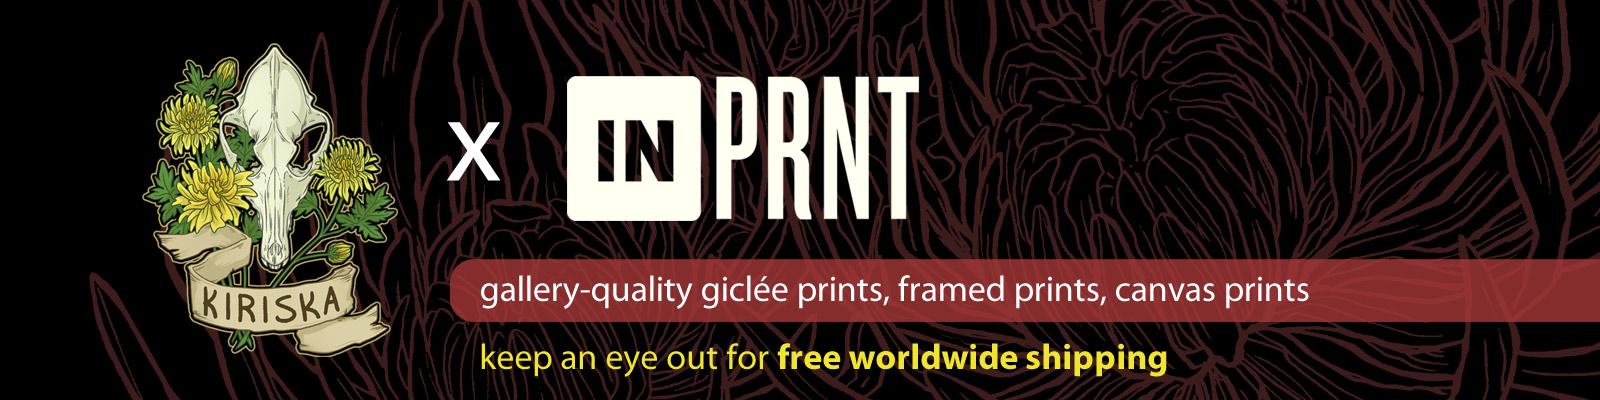 Print on demand via INPRNT